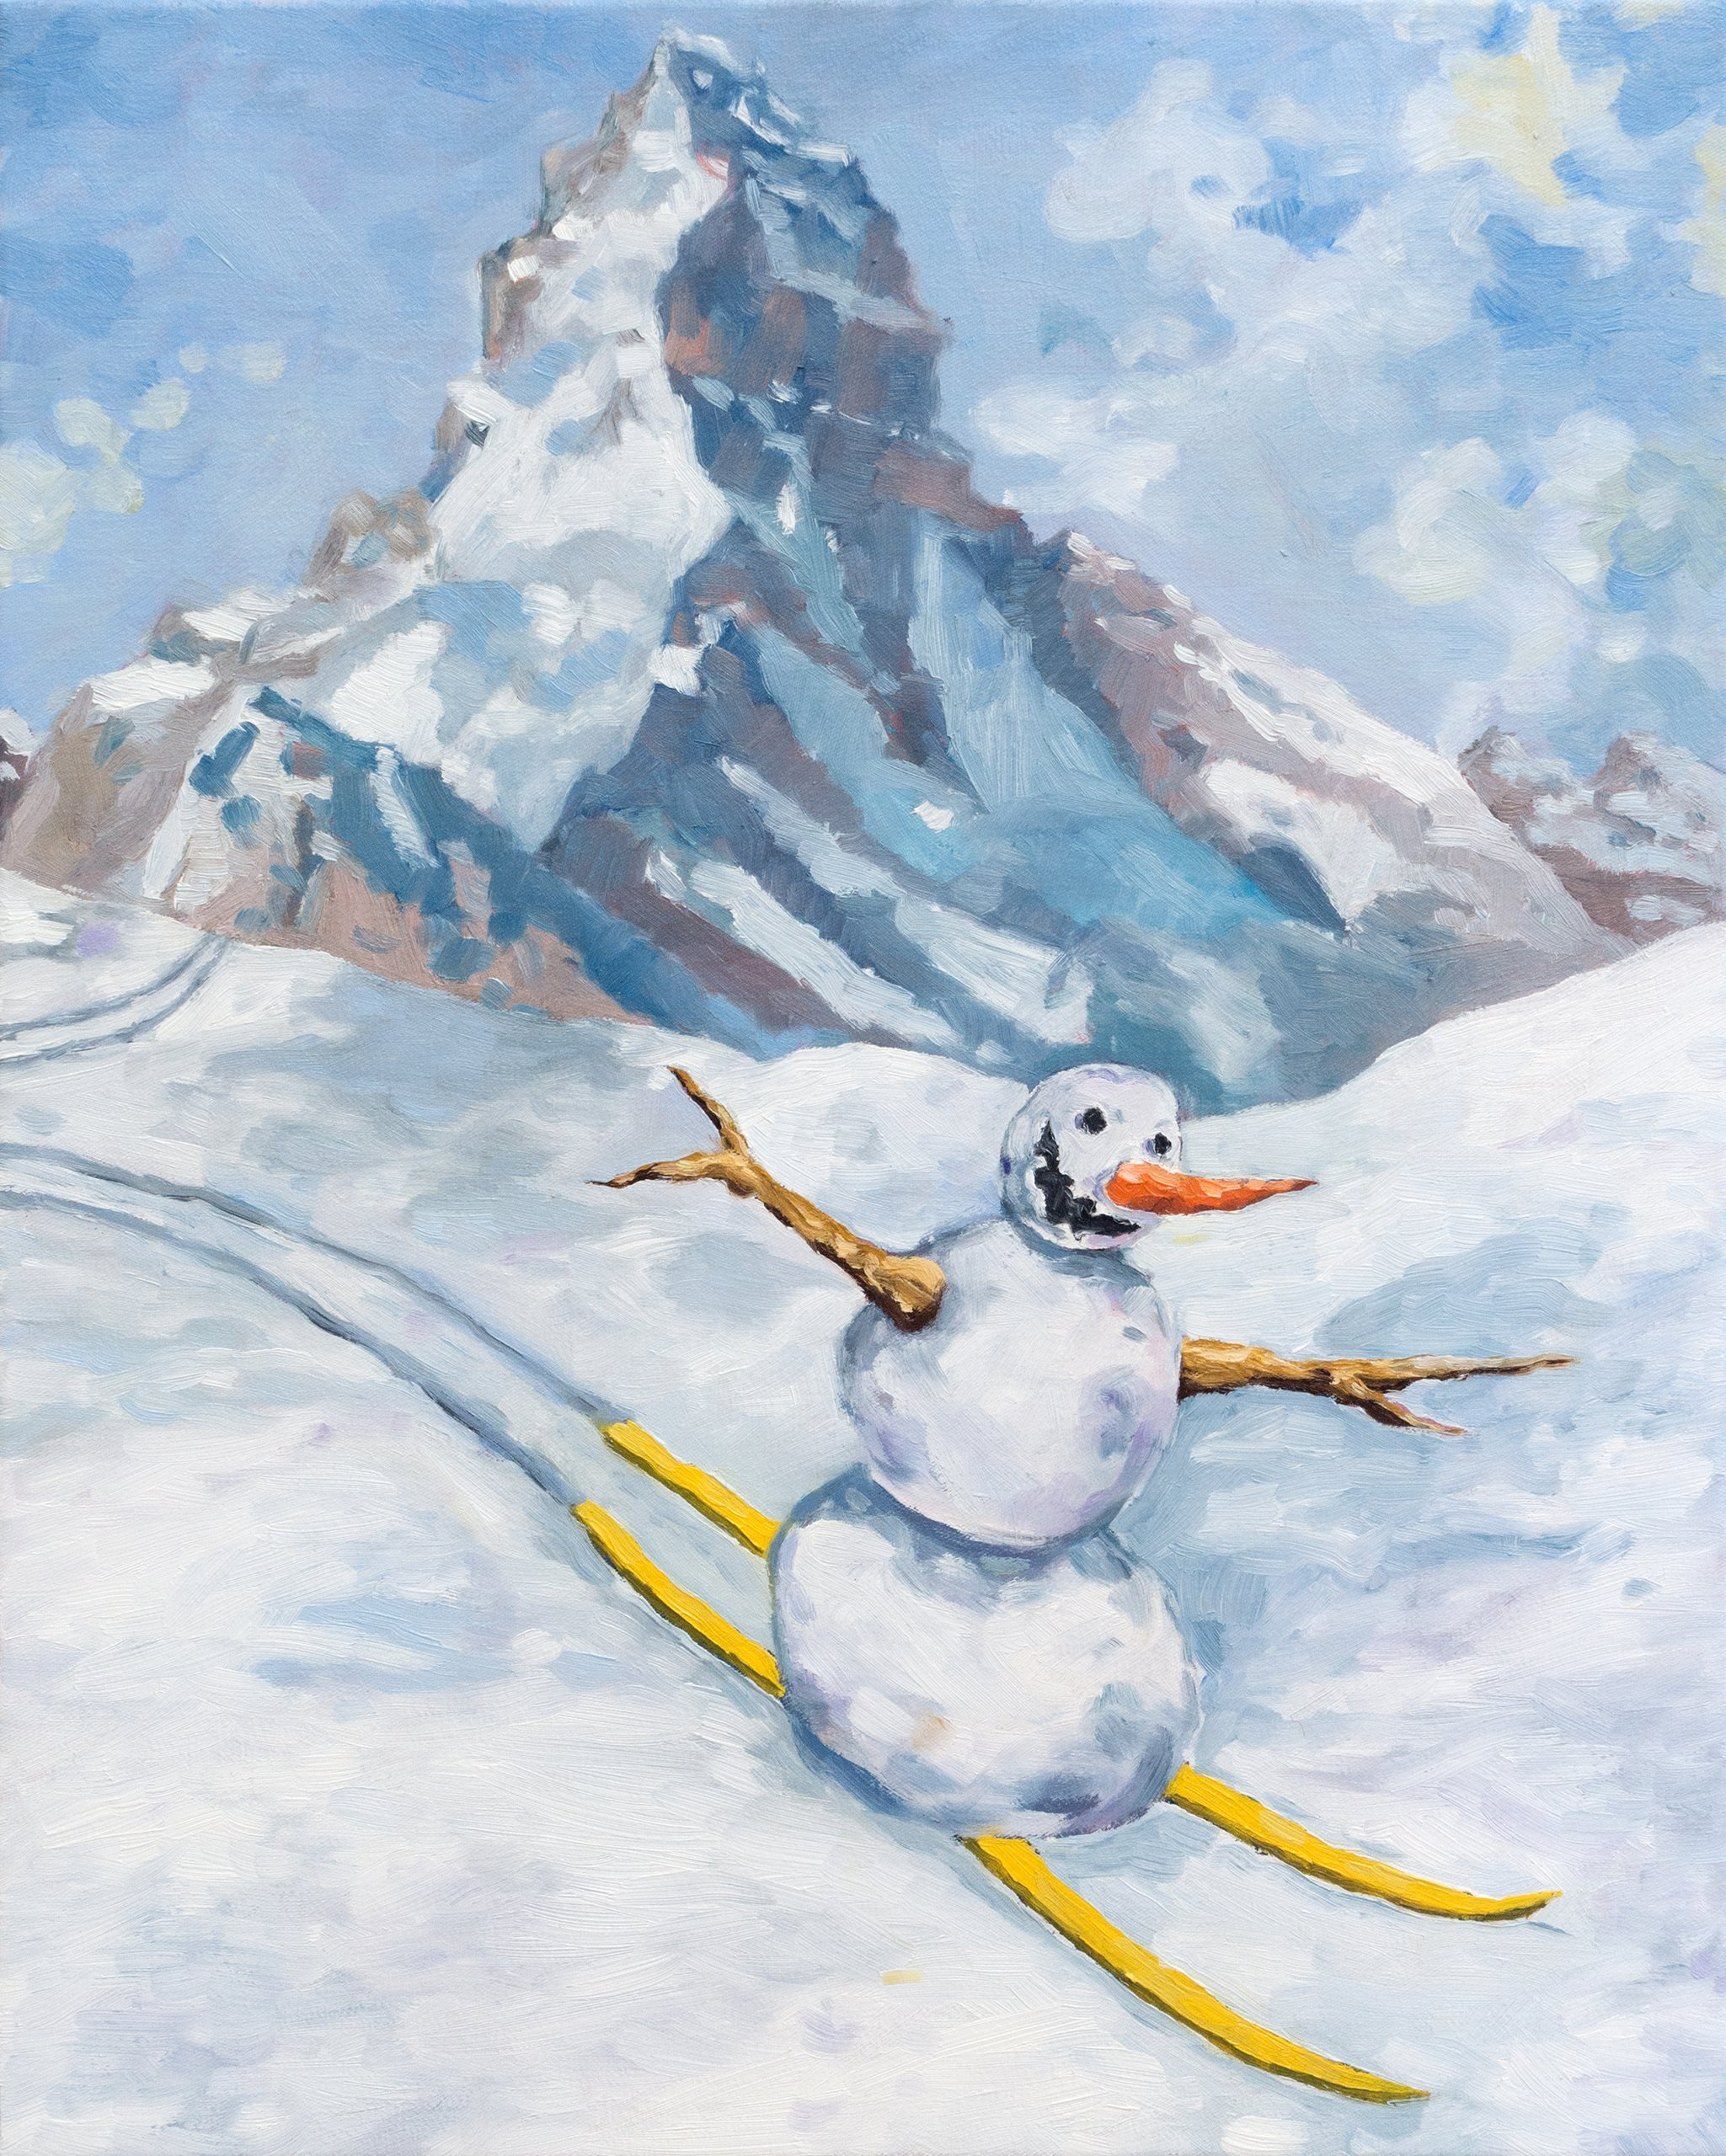 Jan Kiefer Skiing Snowman Swiss Institute